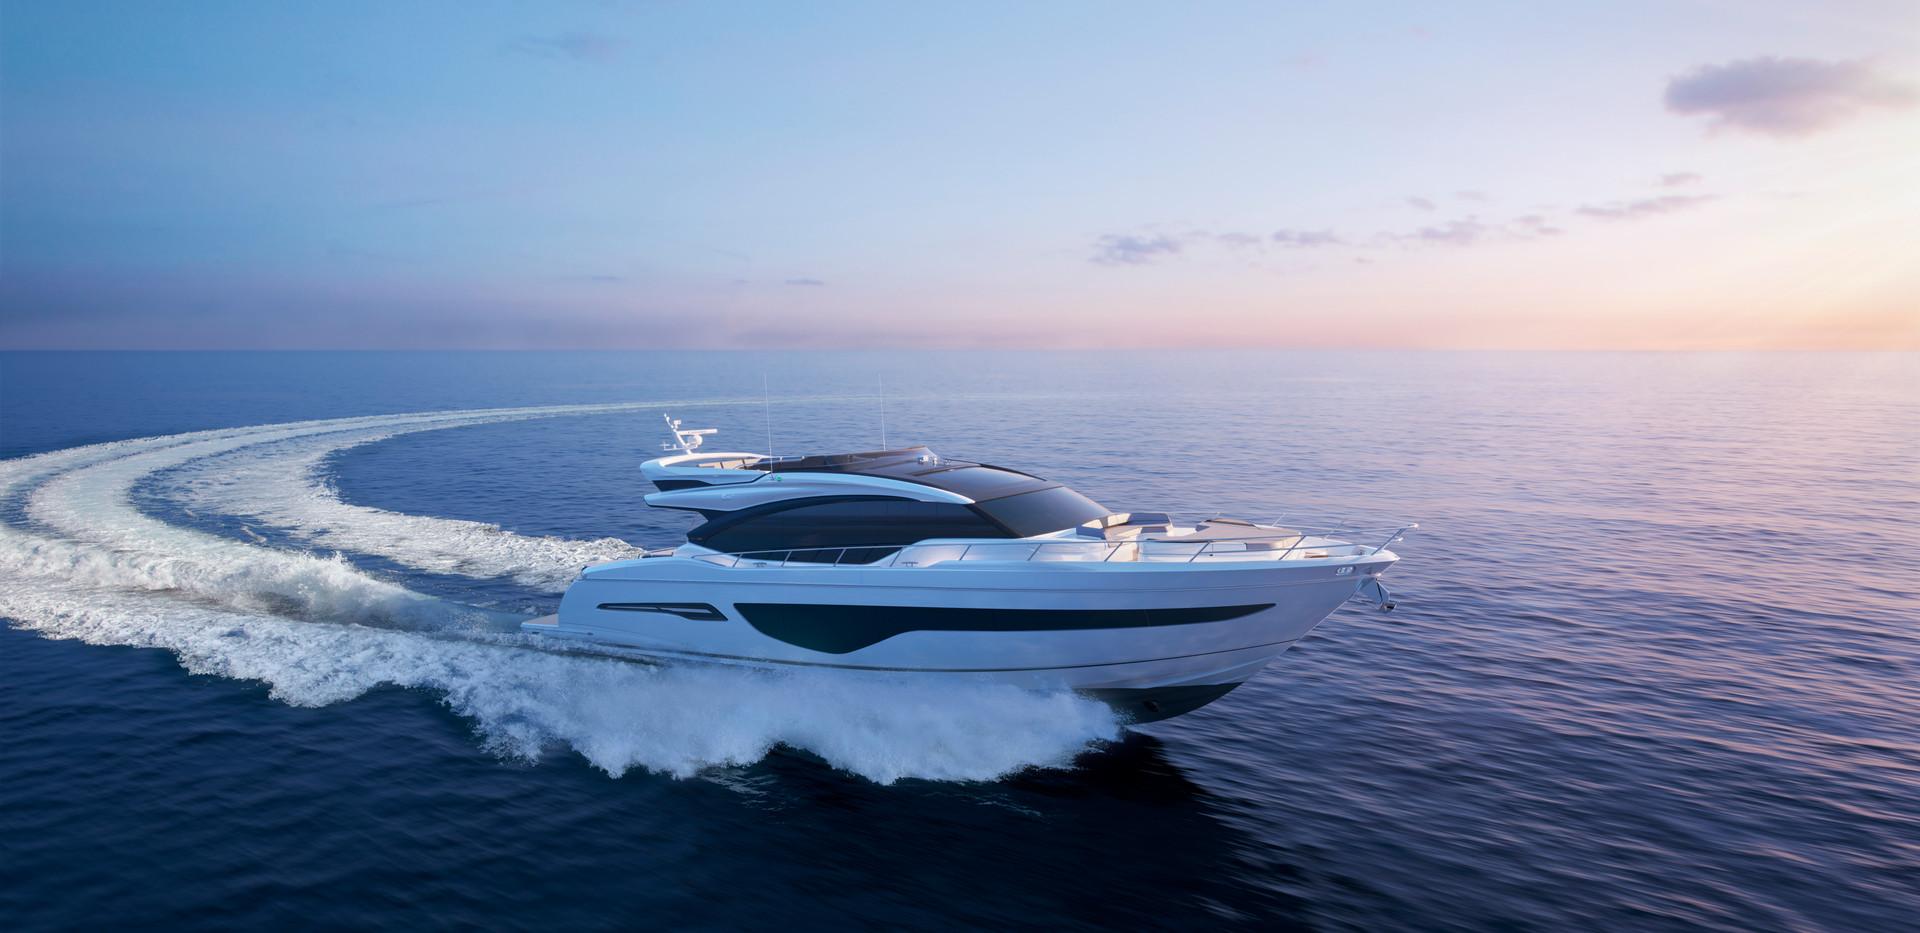 s78-exterior-white-hull-cgiAbromowitz Sh